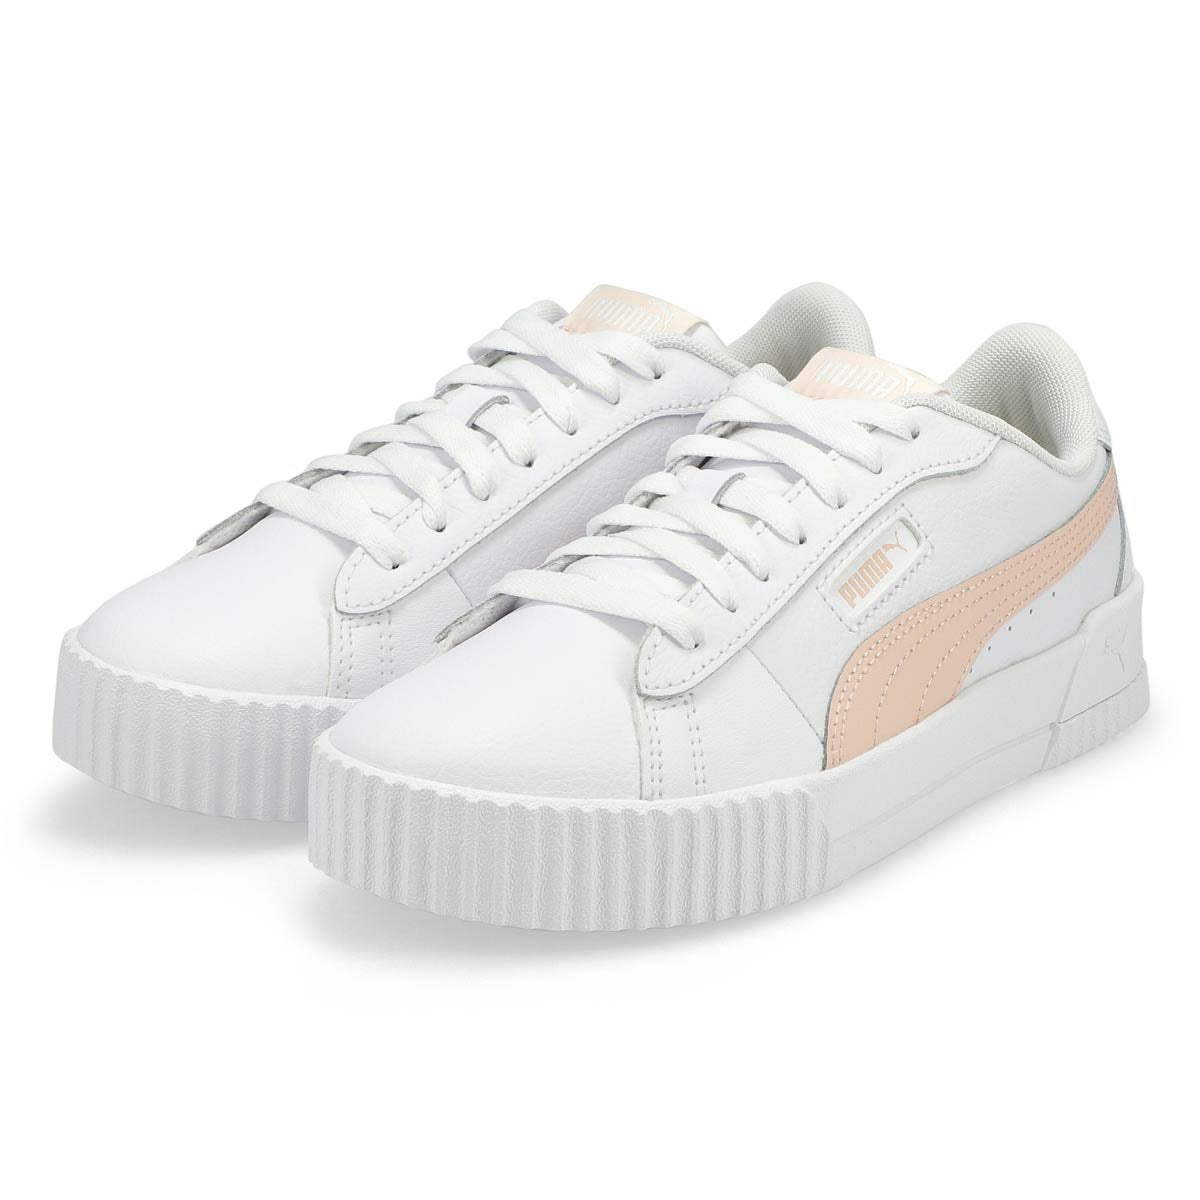 Women's Carina Crew Sneaker - White/Cloud Pink